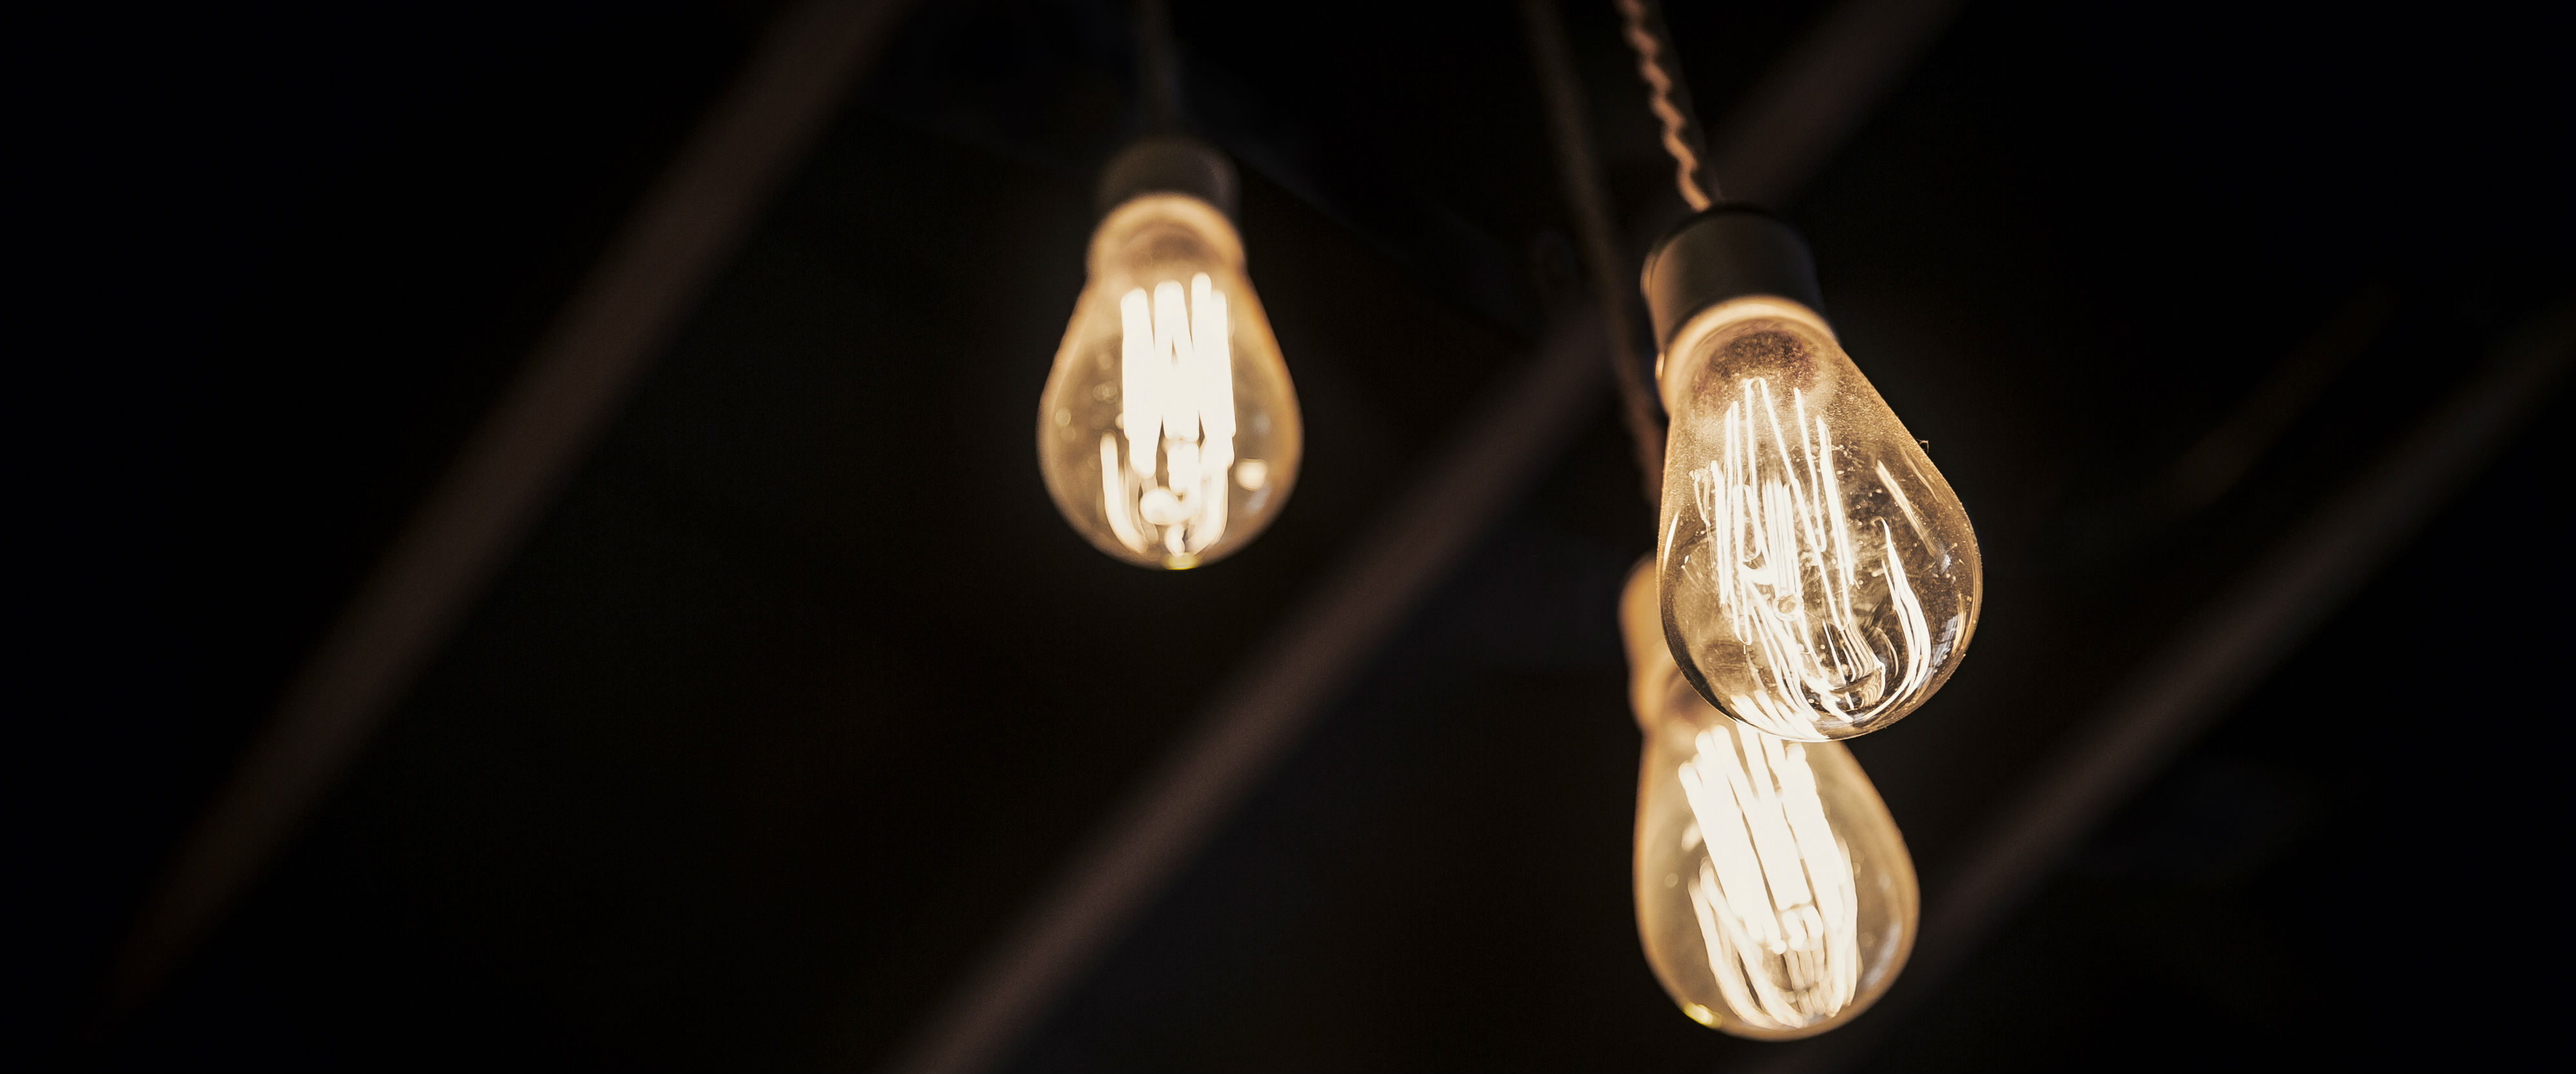 Politics behind going green -Lamps